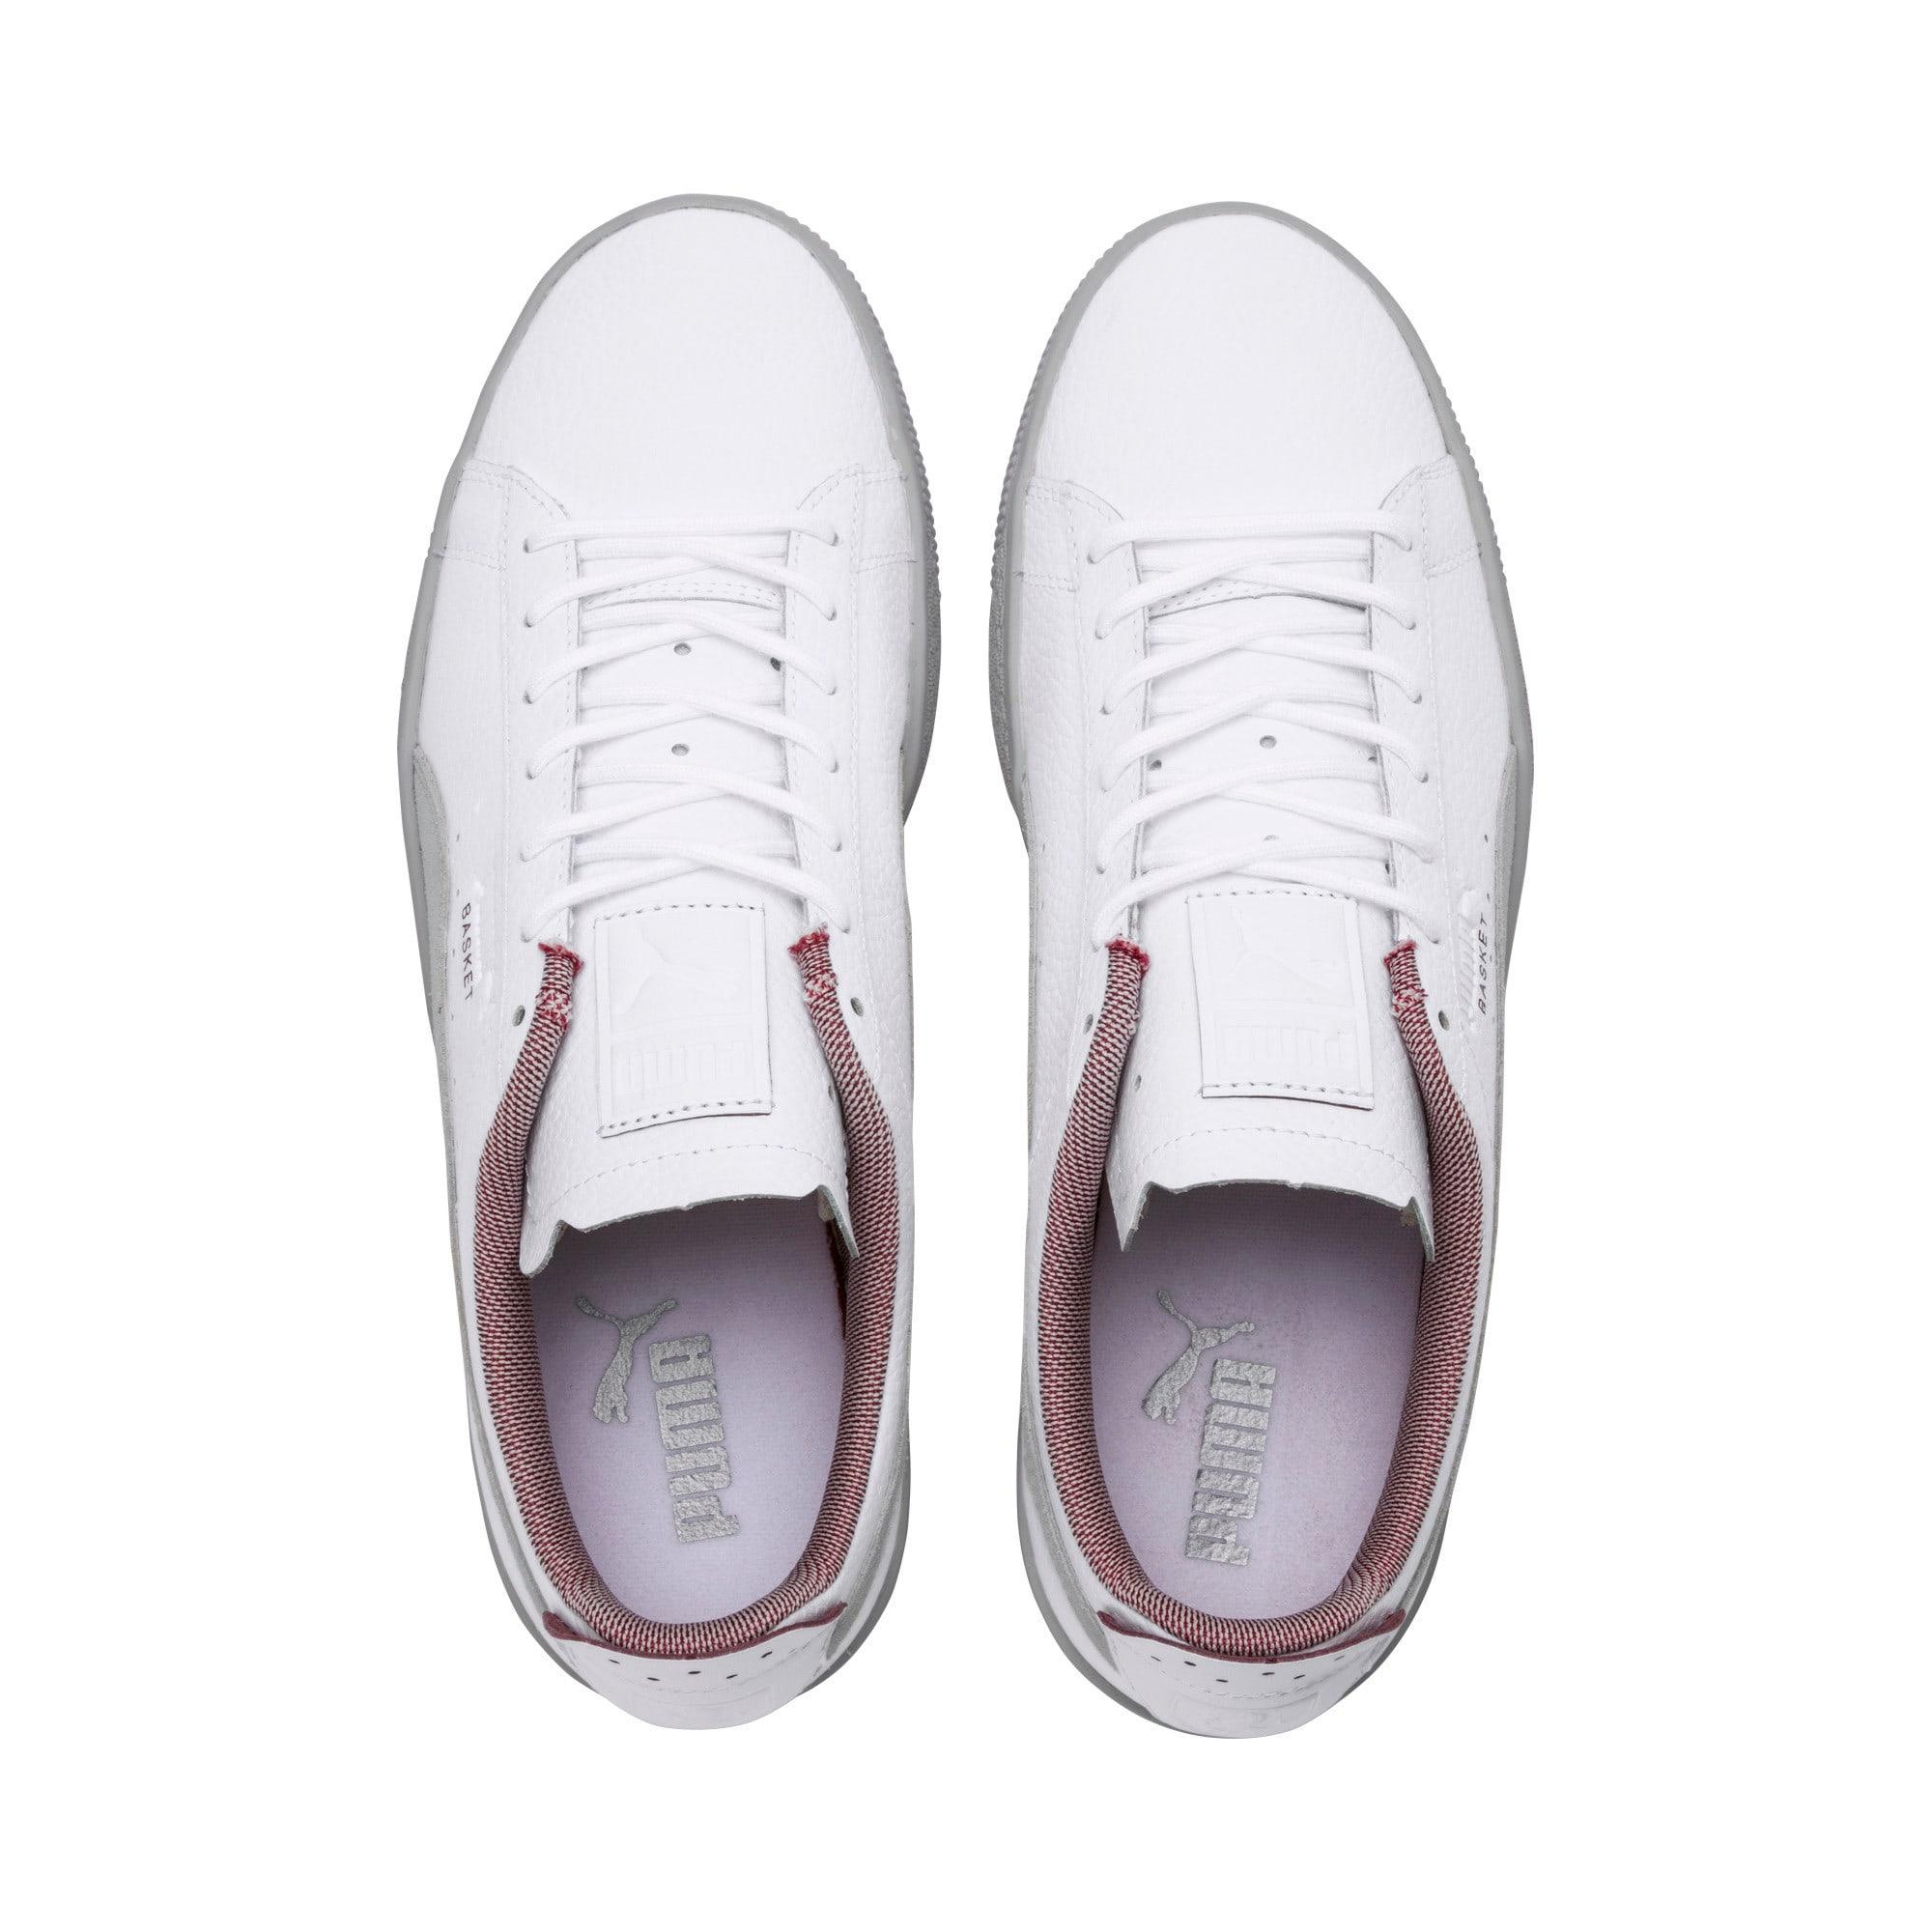 Thumbnail 6 of Scuderia Ferrari Basket Sneakers, Puma White-Glacier Gray, medium